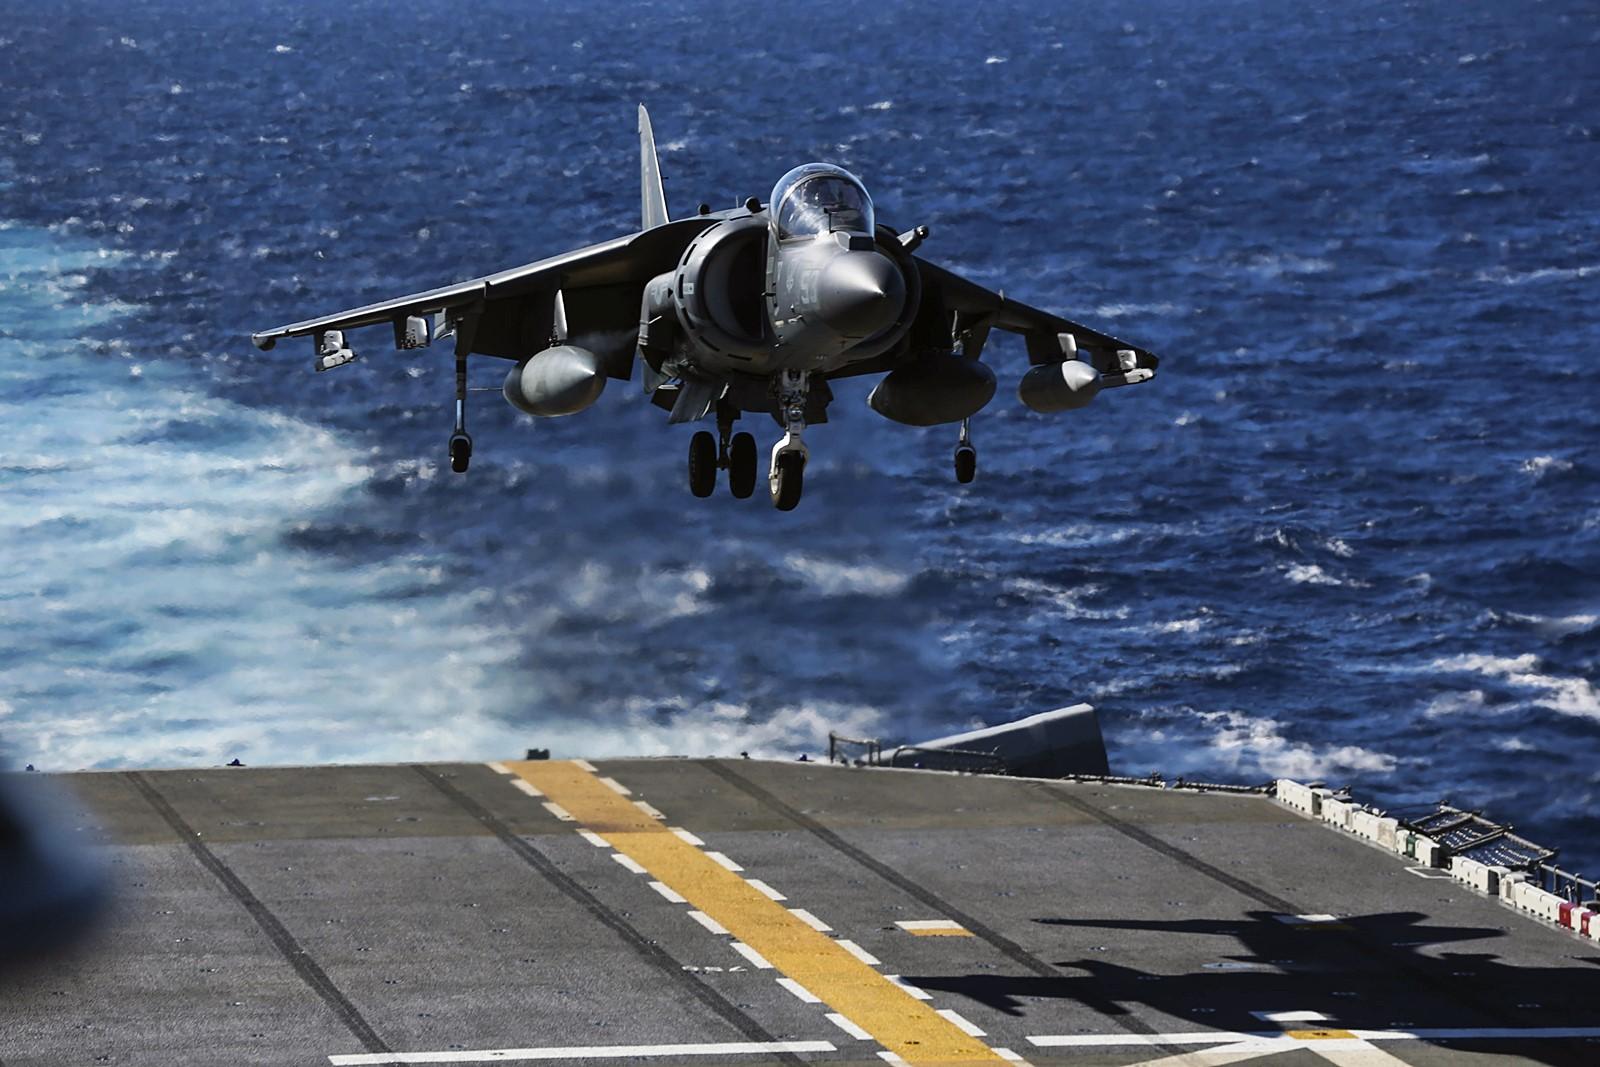 Essex (LHD 2) 상륙함에서 비행훈련하는 AV-8..